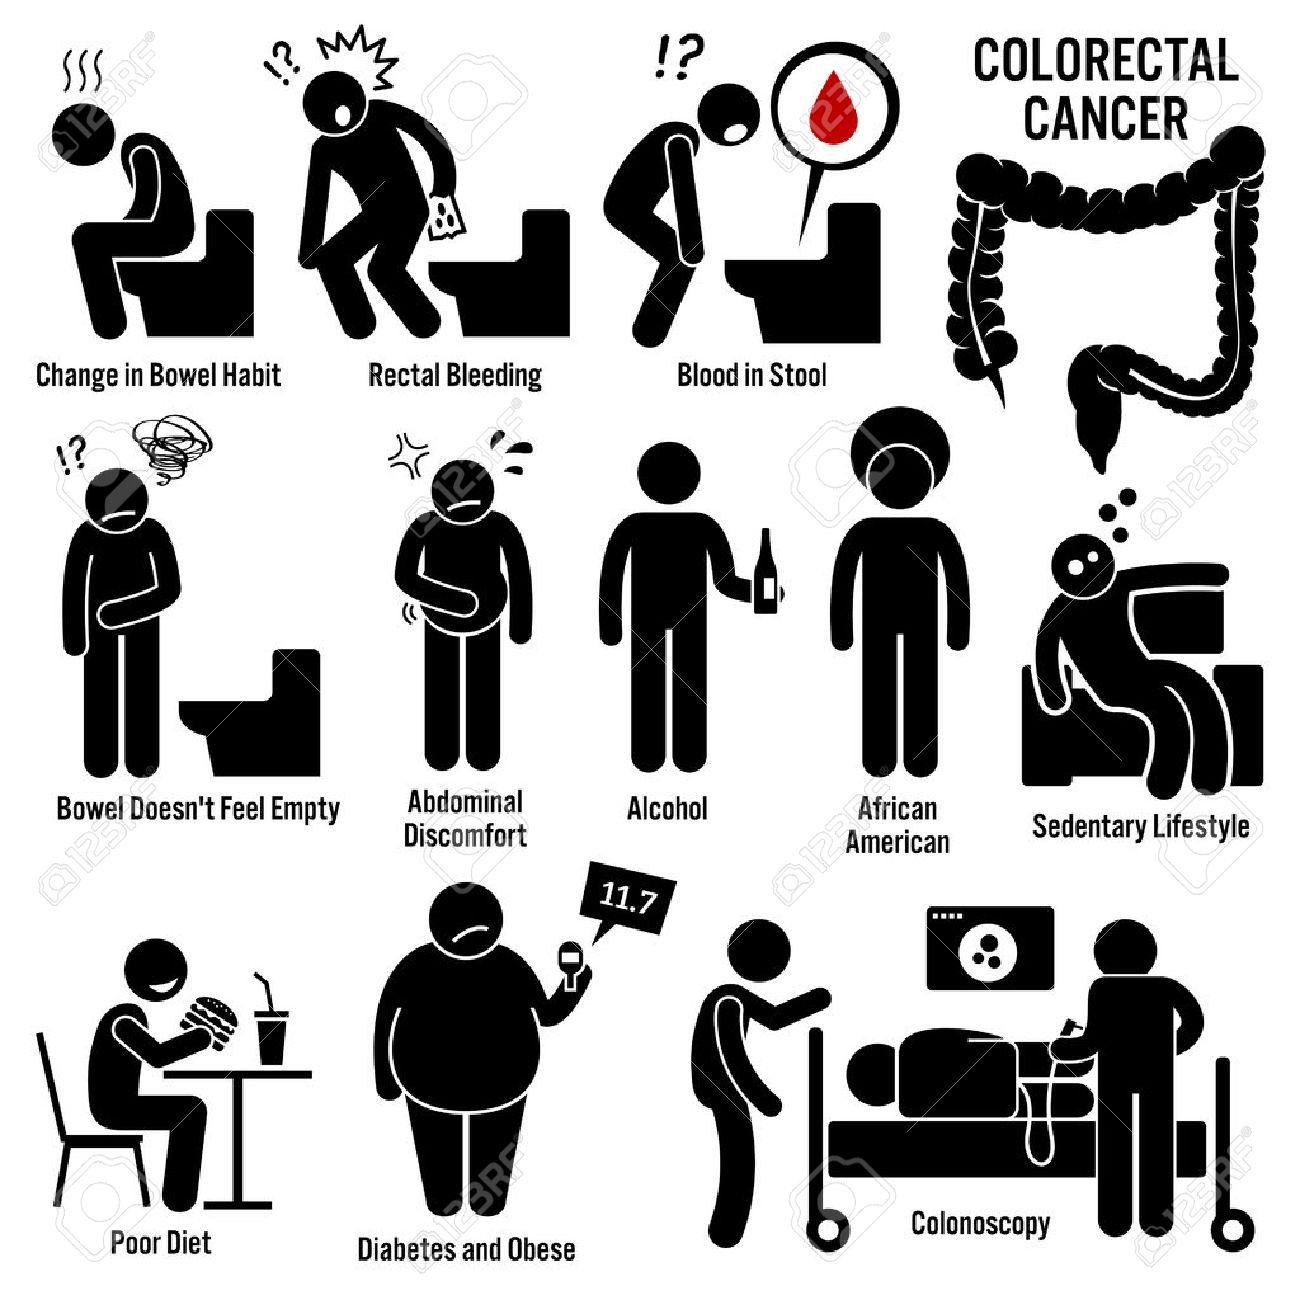 cancer colon diagnostic